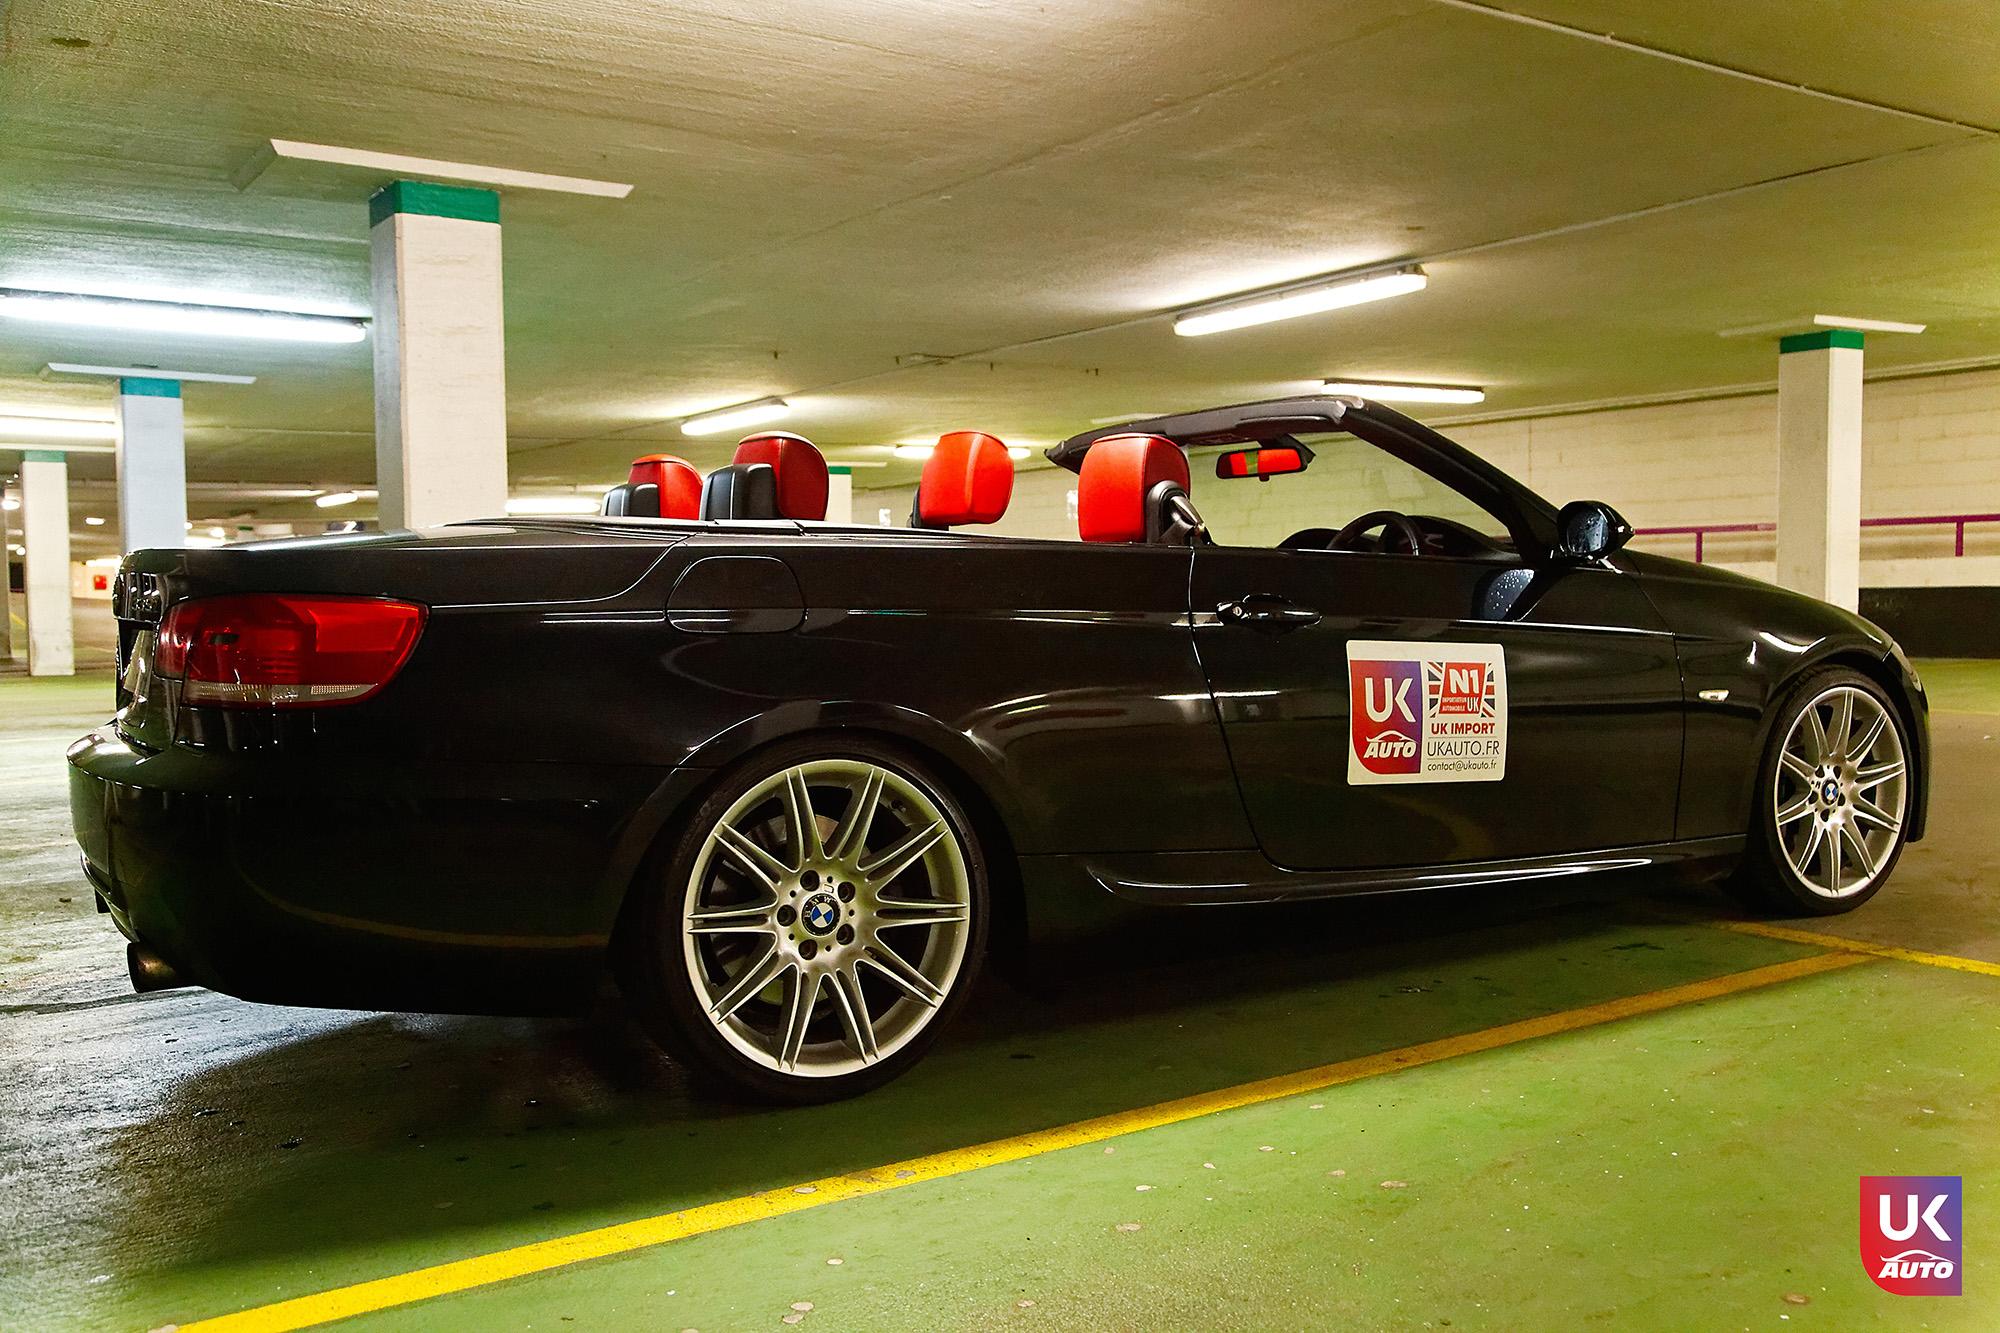 UKAUTO IMPORT ANGLETERRE BMW 335i CABRIOLET UKA RHD19 - Felecitation a Jeremie pour cette BMW 335i cabriolet RHD PACK M IMPORT AUTO ANGLAISE